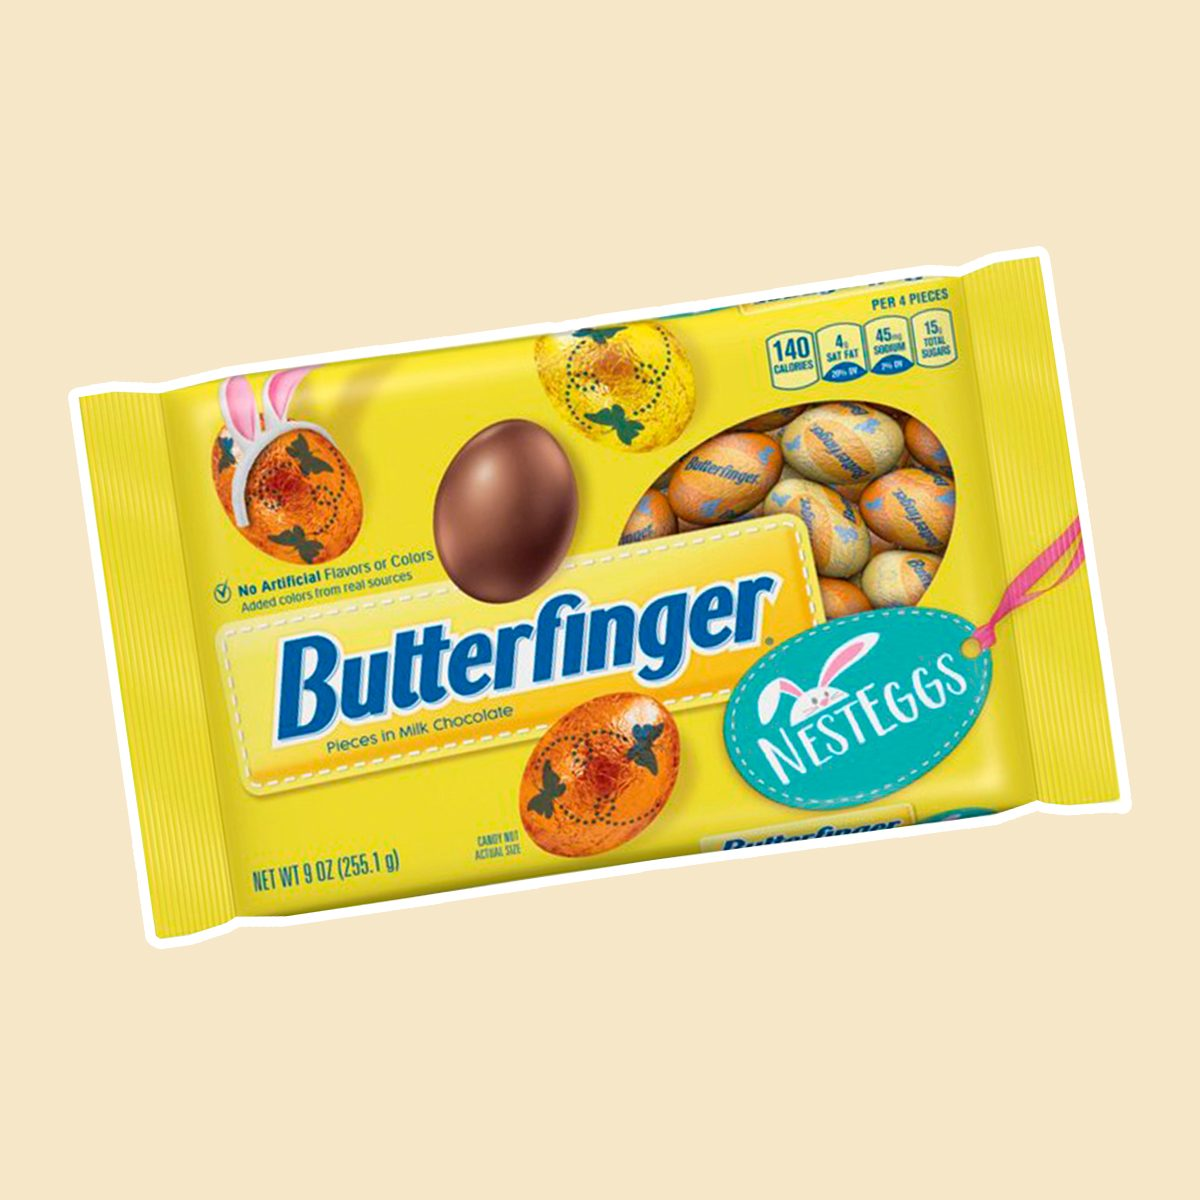 Butterfinger Chocolate Nesteggs Easter Candy